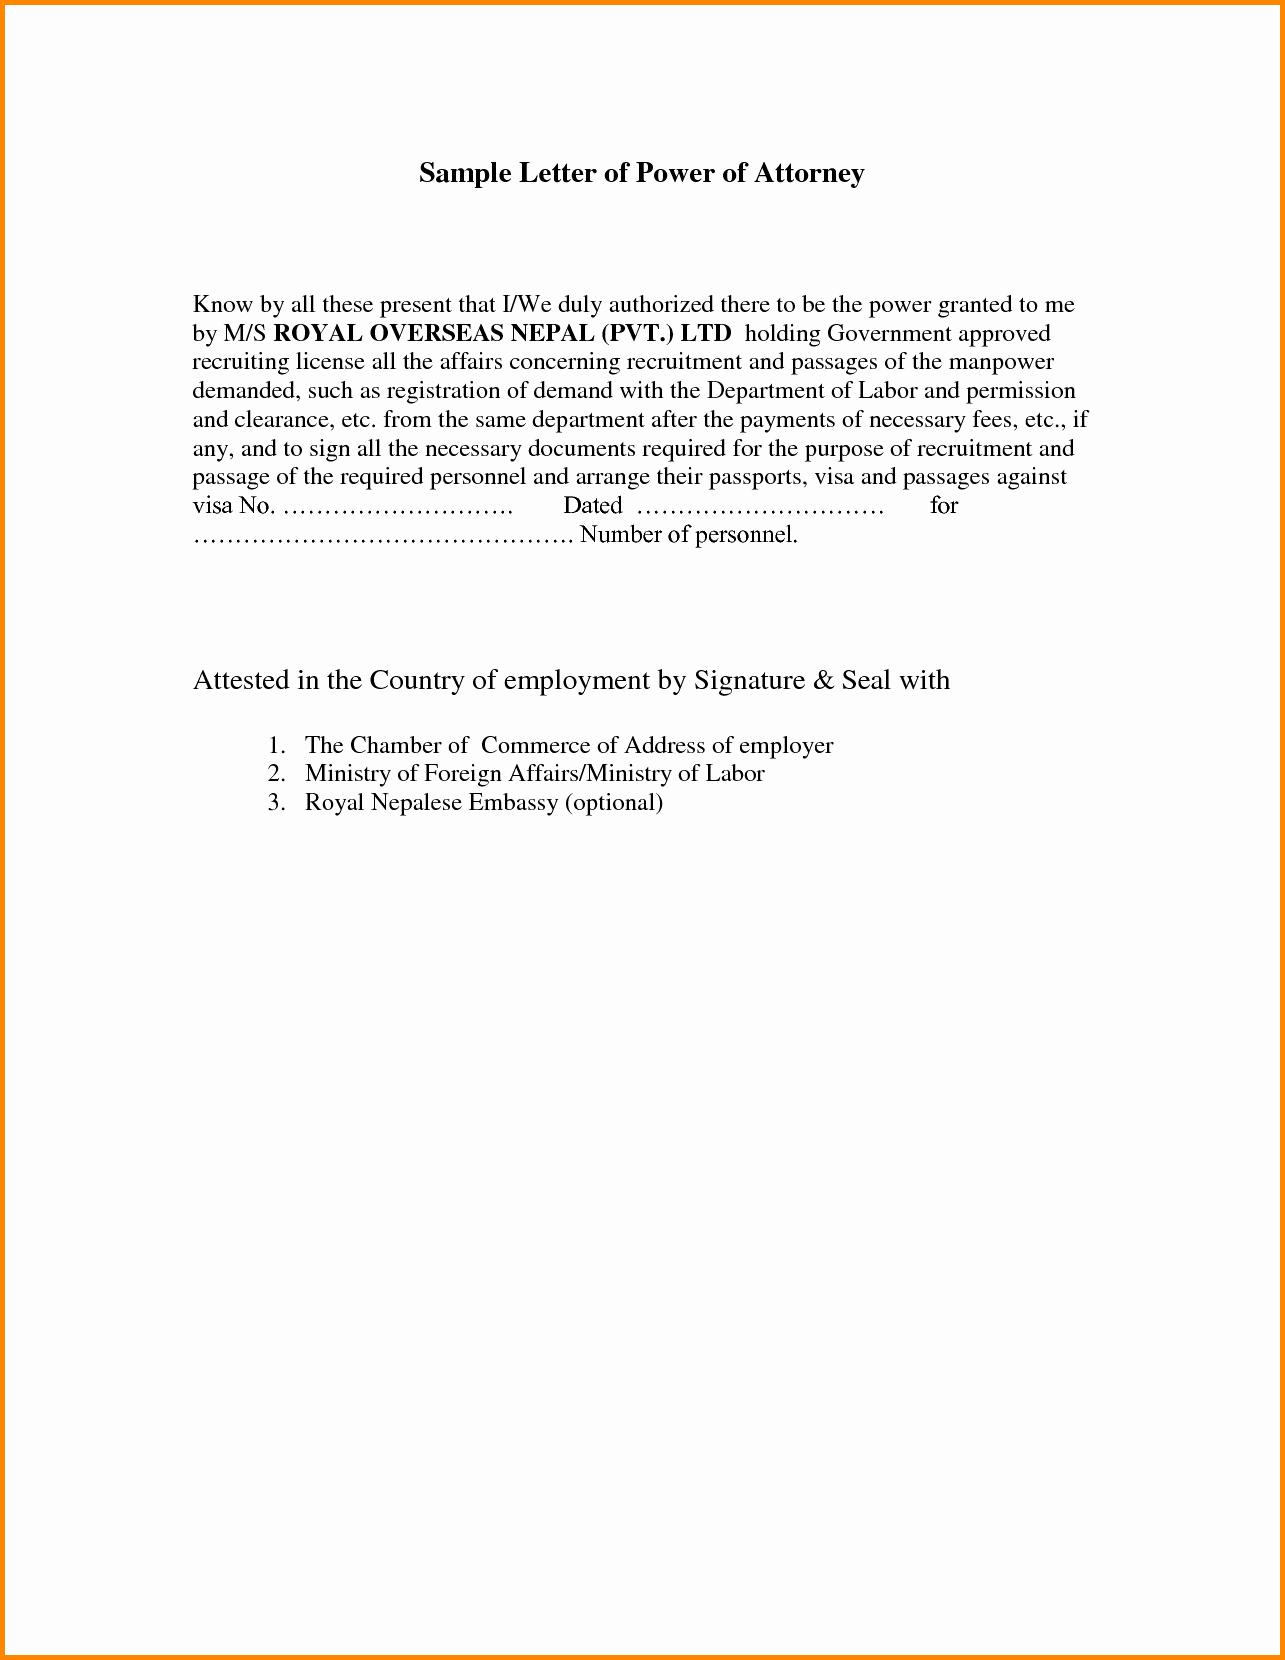 Power Of attorney Sample Letter Elegant Power attorney Resignation Letter Template Samples